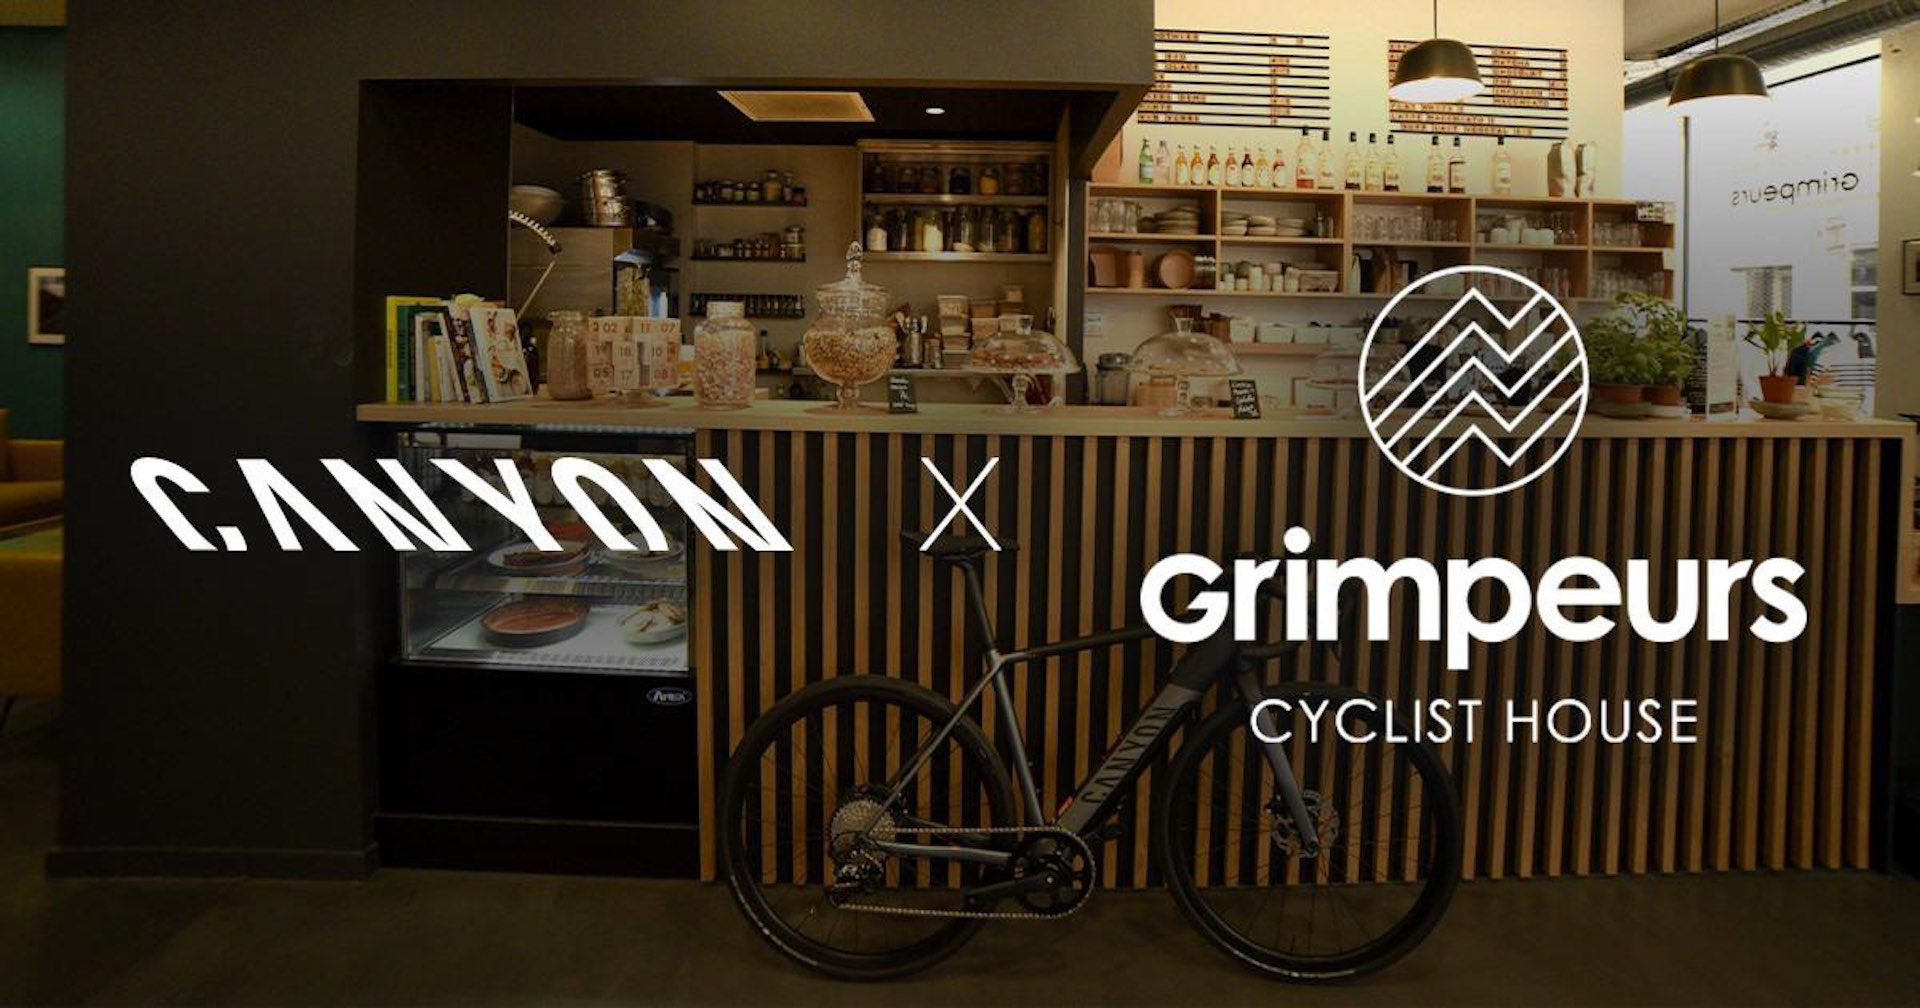 Canyon Grimpeurs Cyclist House